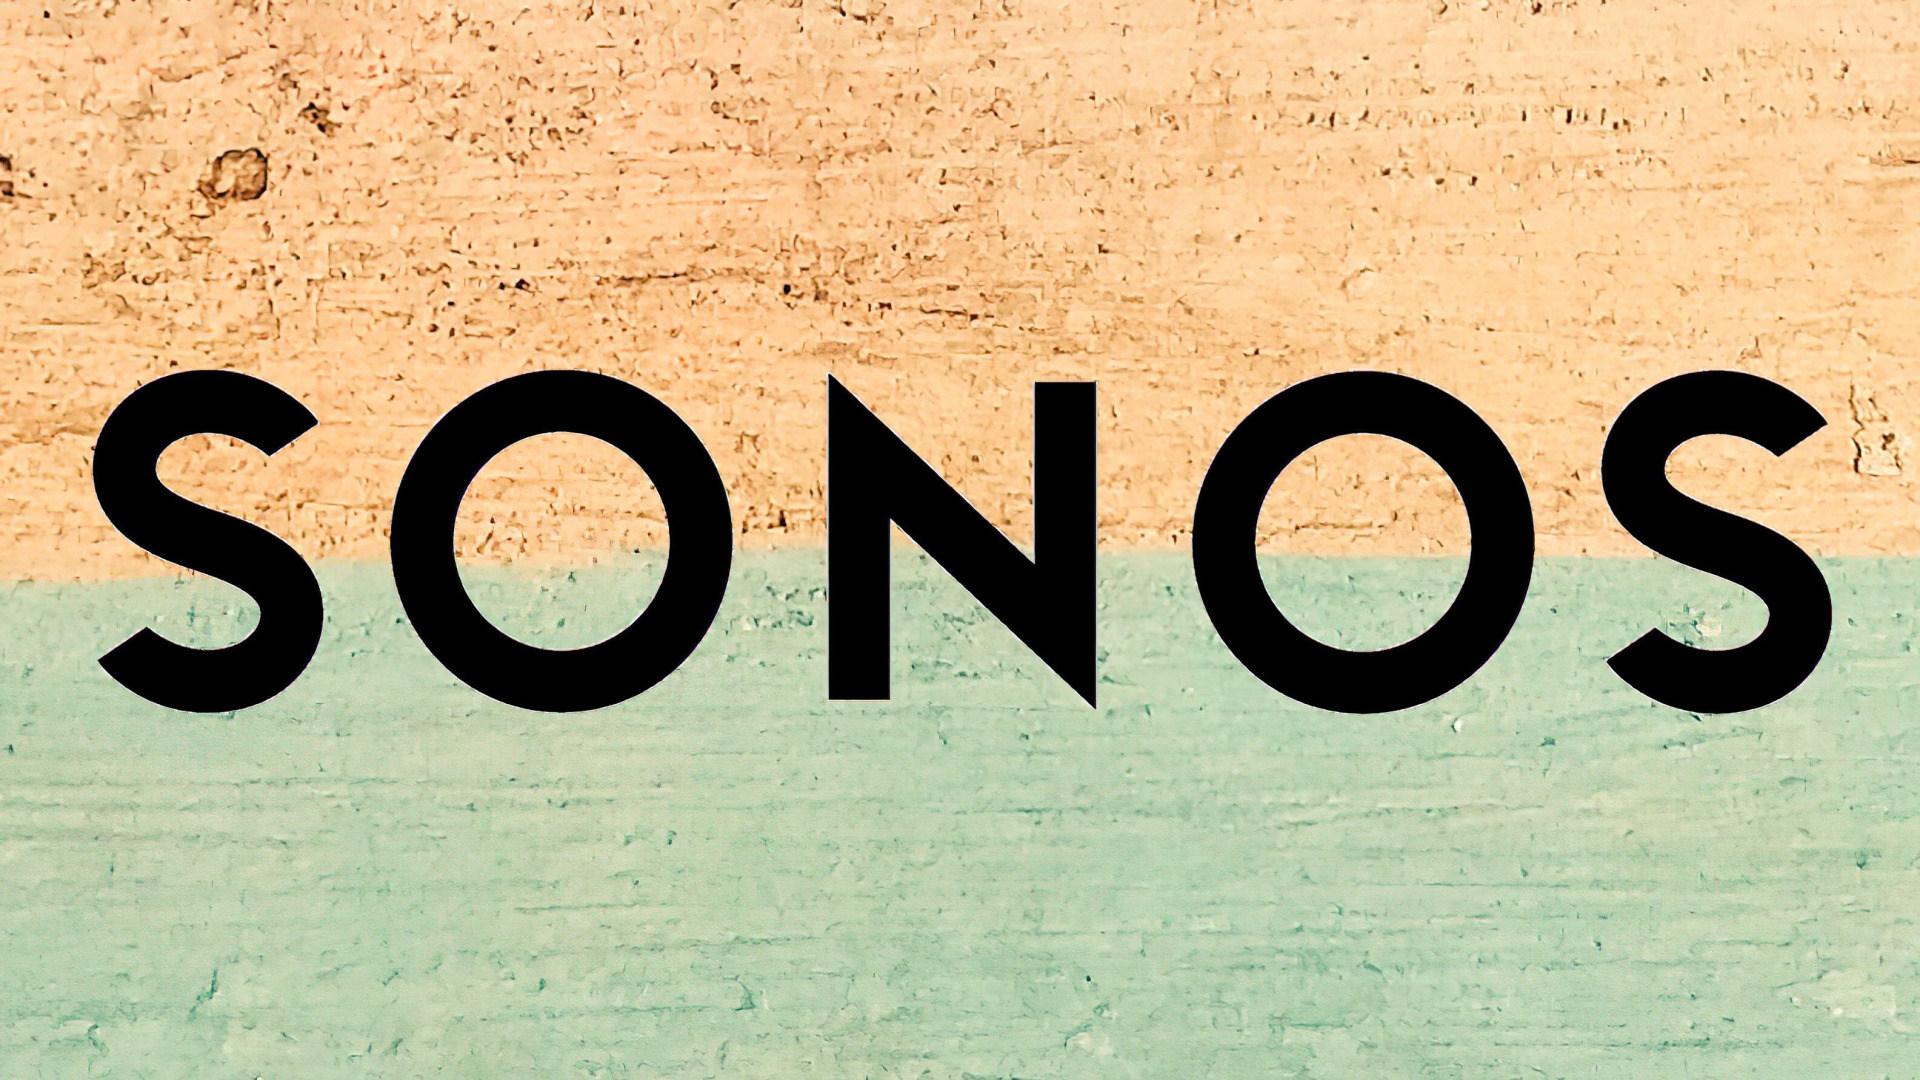 Streaming, Logo, Wlan, Audio, Lautsprecher, Smart Home, Sonos, speaker, Smart, Sonos One, Sonos Move, Sonos Beam